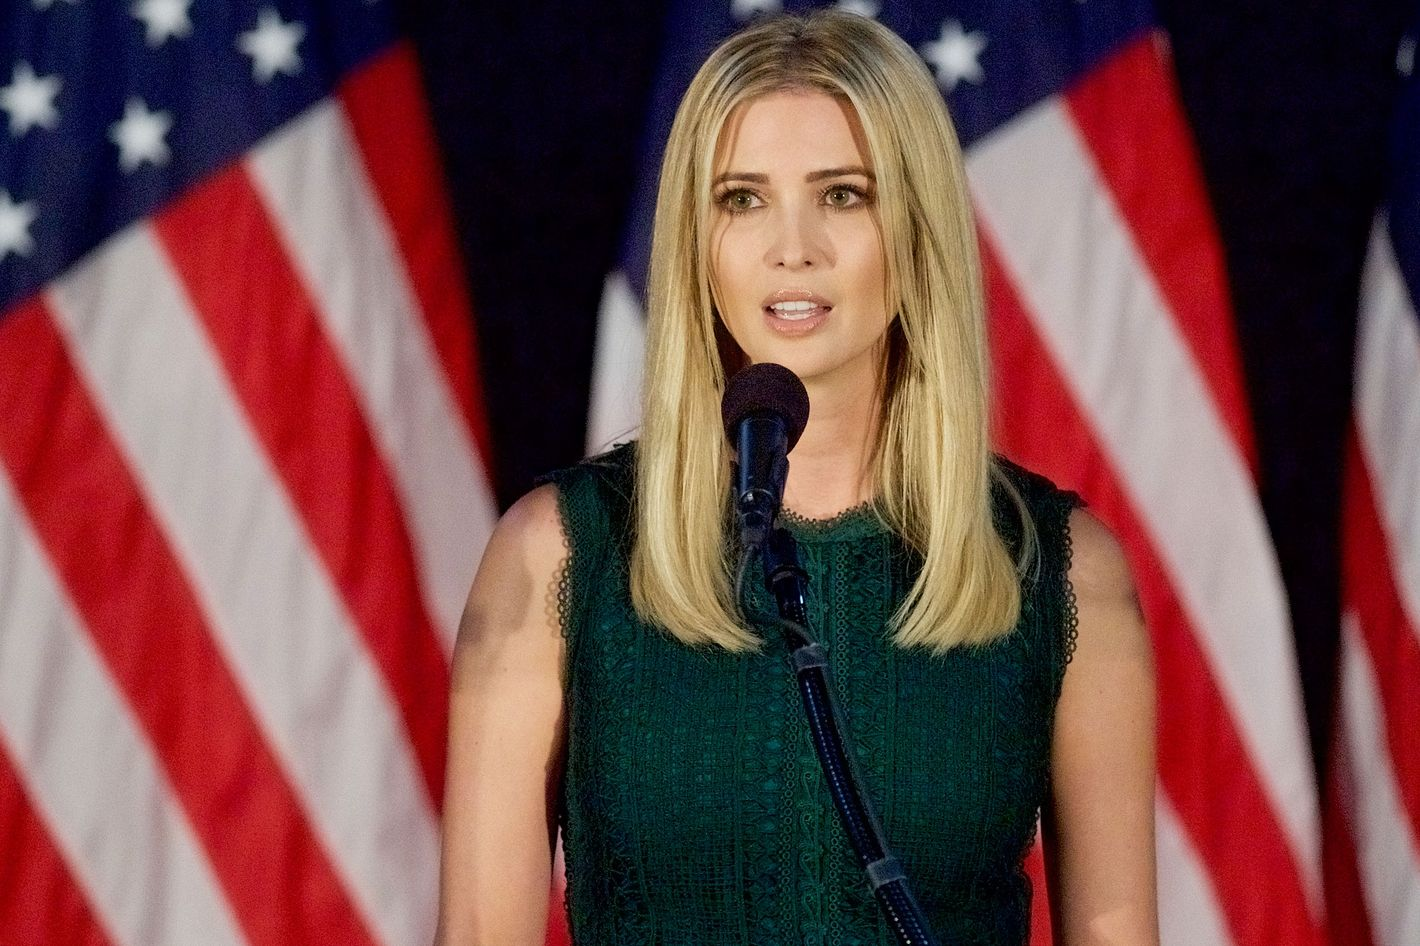 Ivanka Trump Interviewed at Fortune's Most Powerful Women Summit